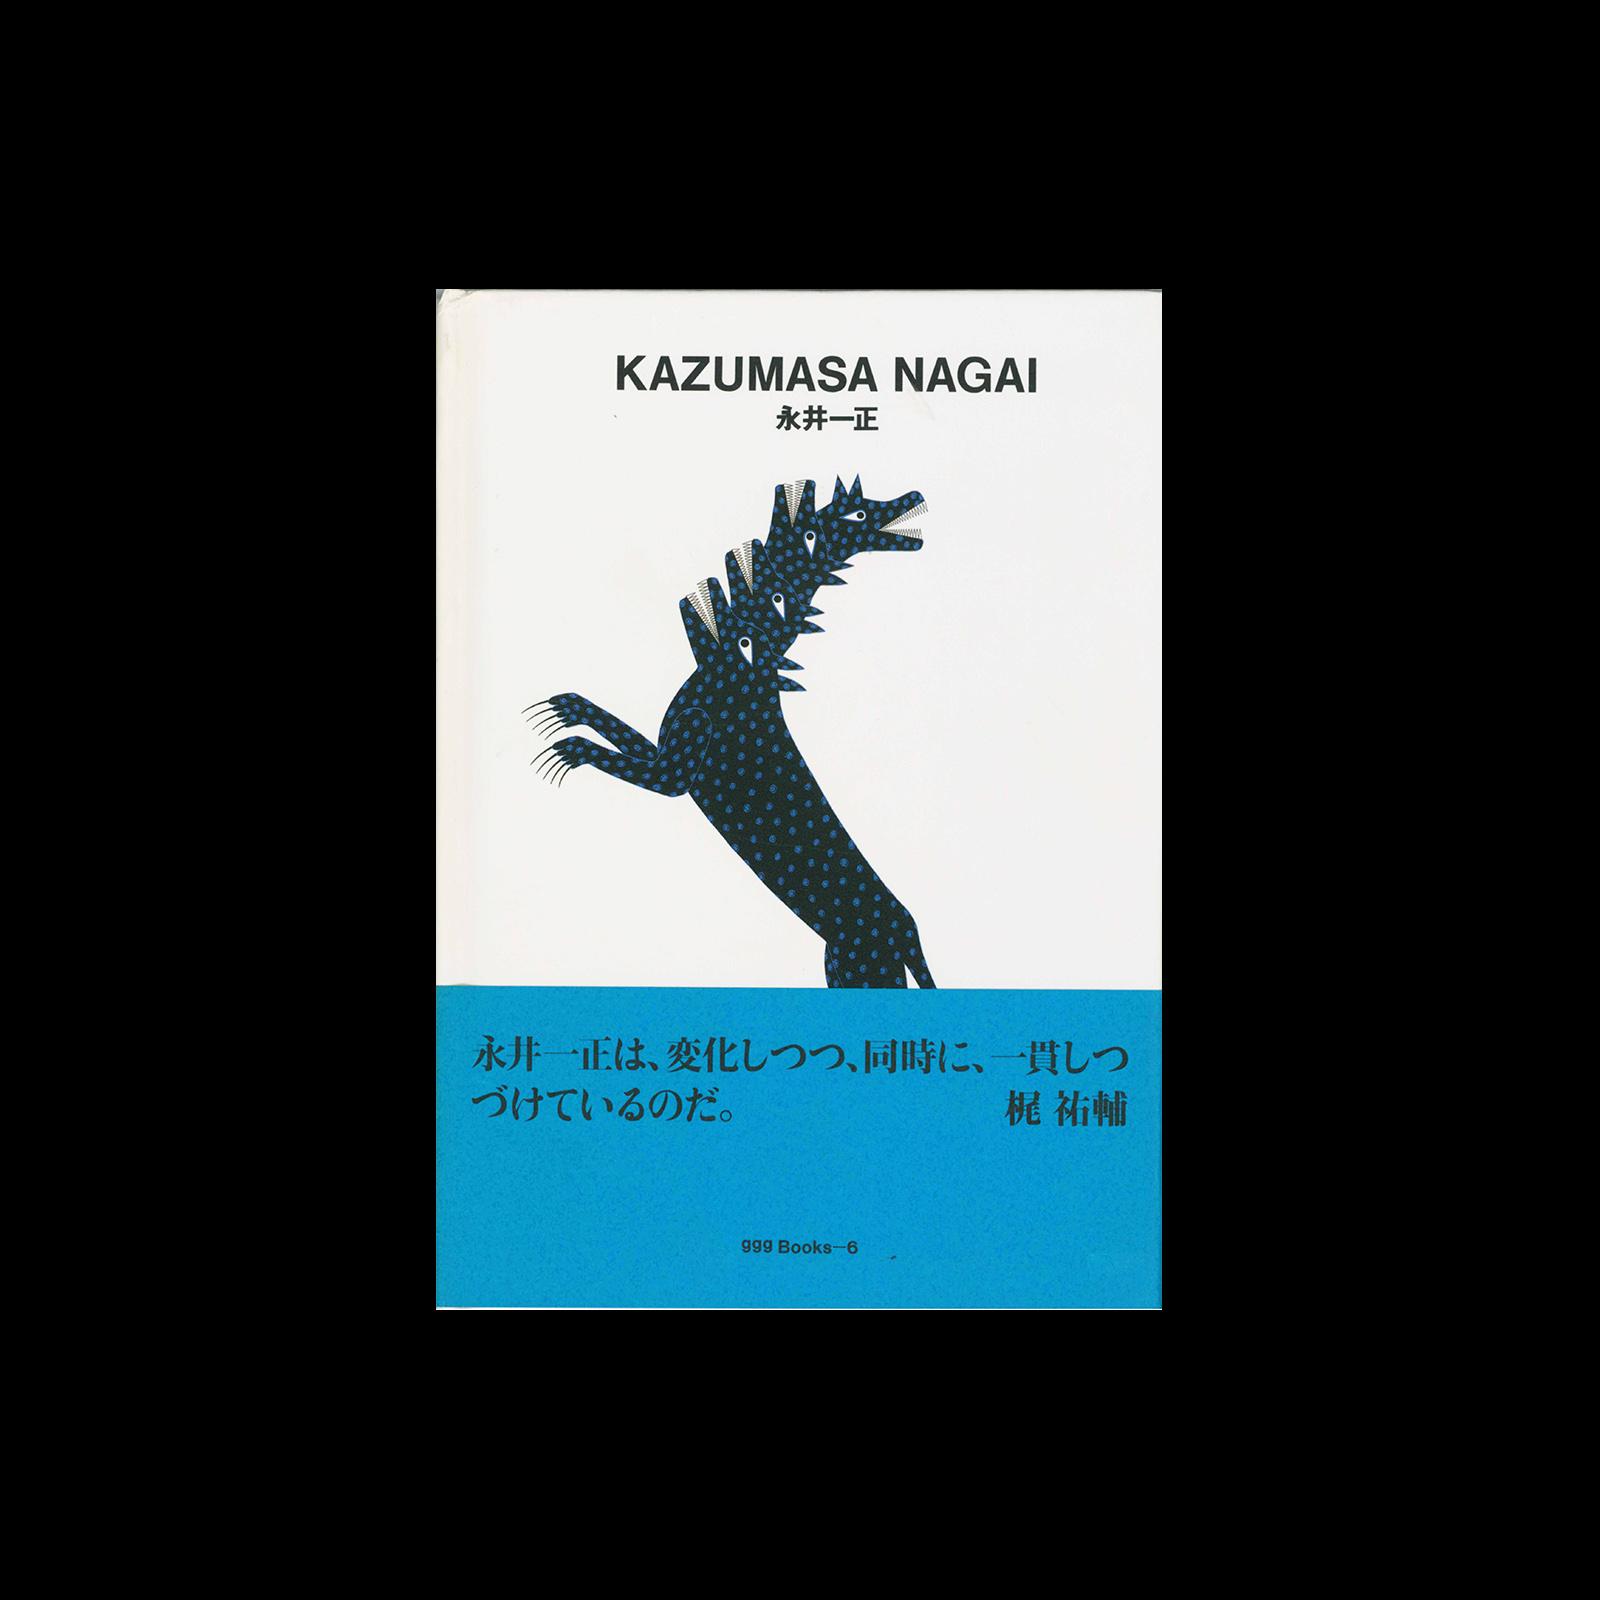 Ginza Graphic Gallery 06, Kazumasa Nagai